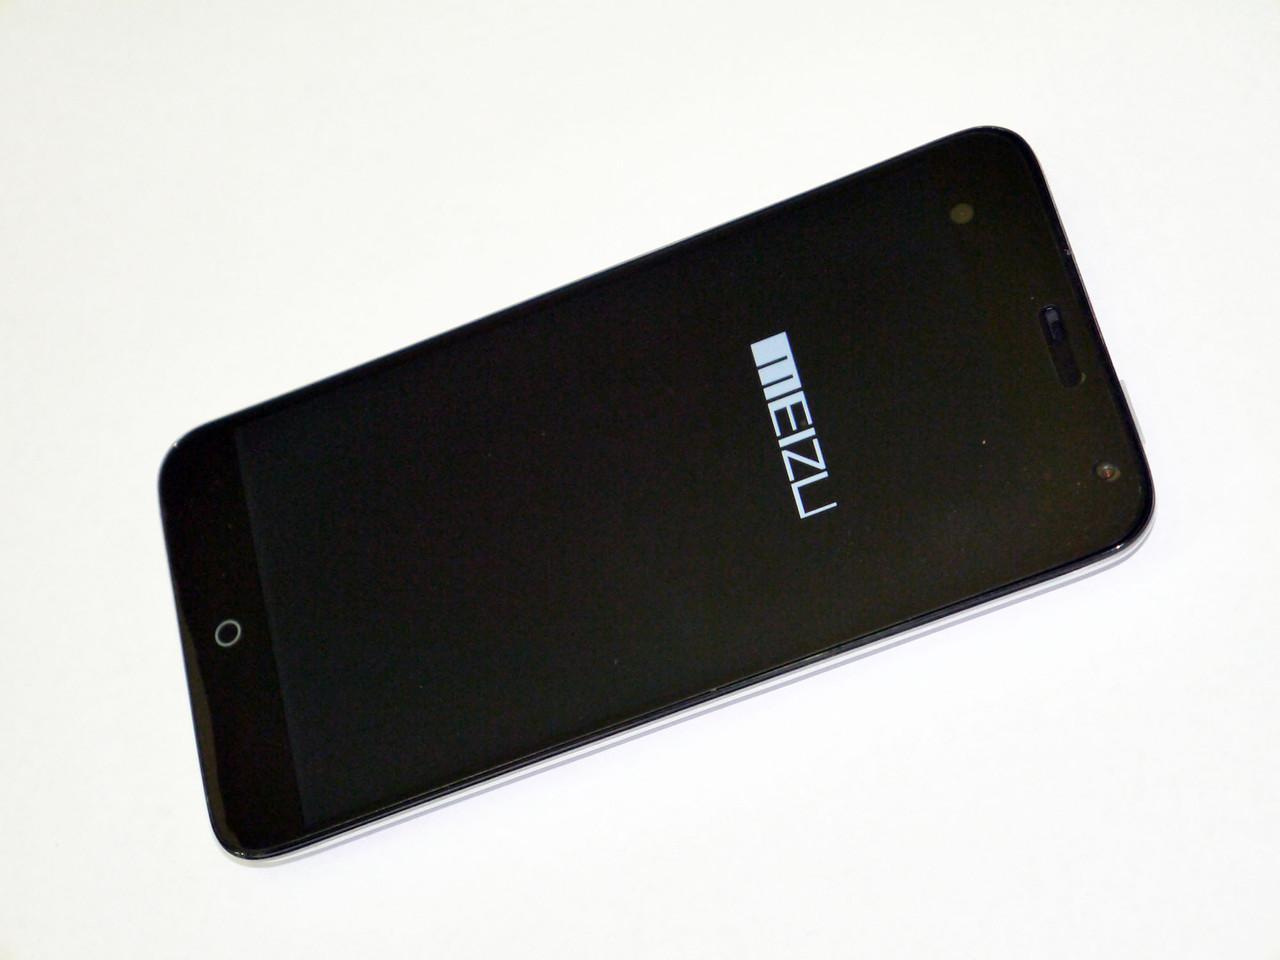 Мобильный телефон Meizu MX3 4 Ядра Android, экран 5, фото 1